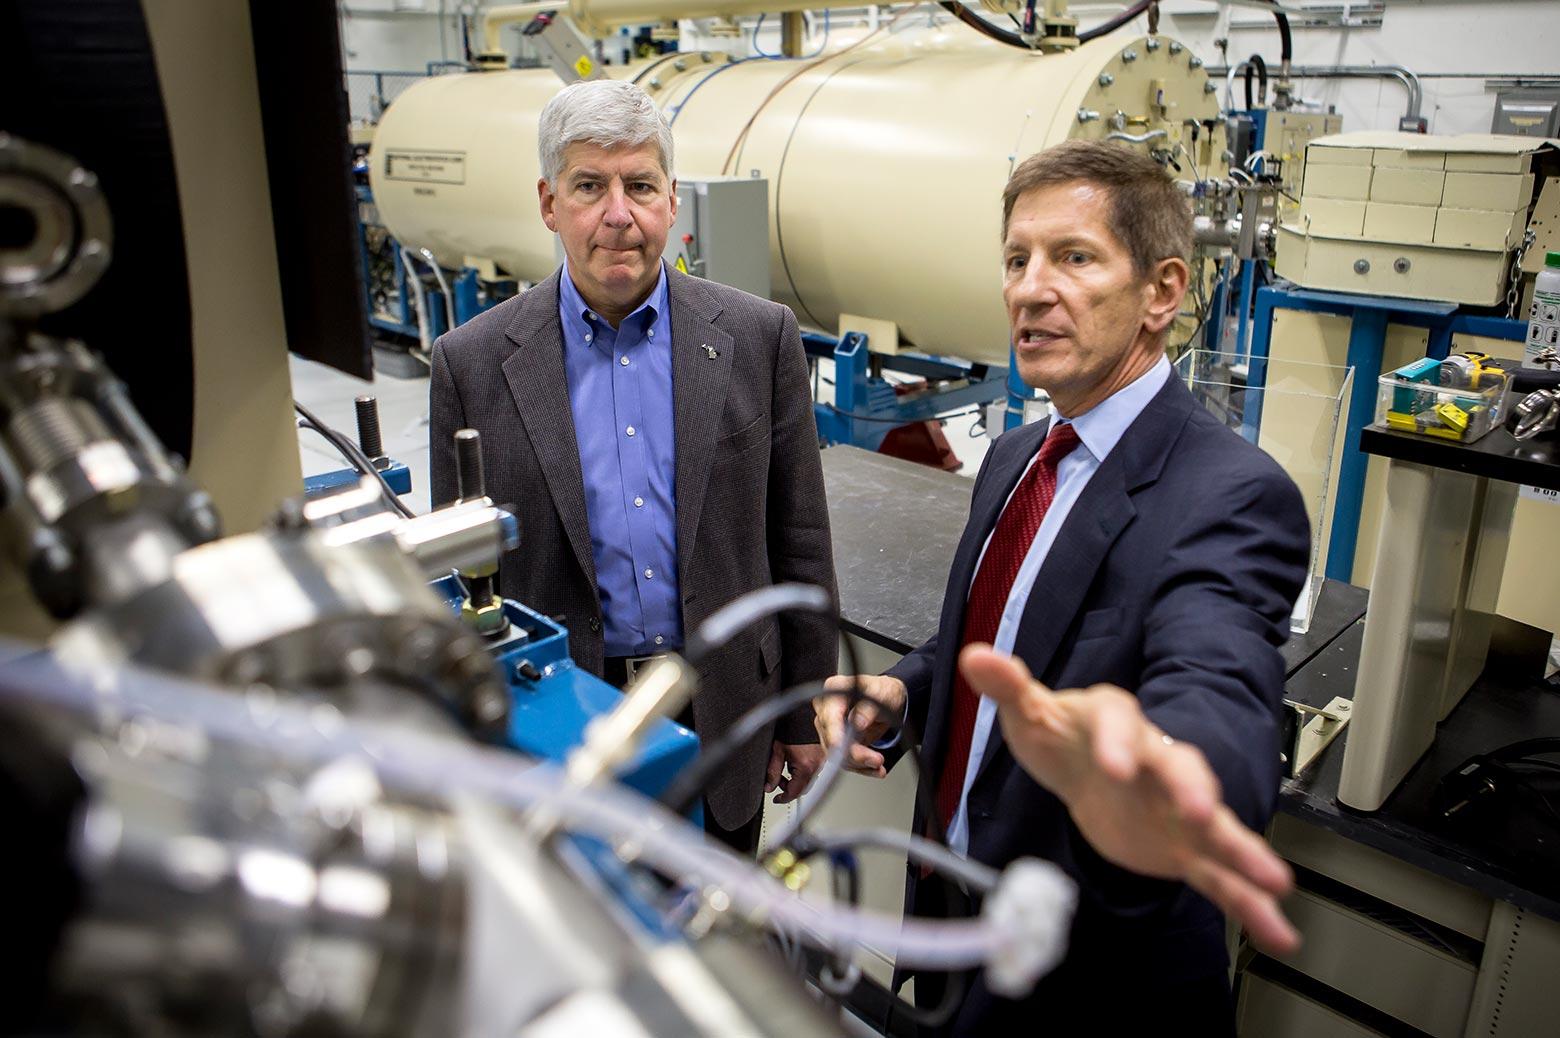 Tour of the Ion Beam Laboratory